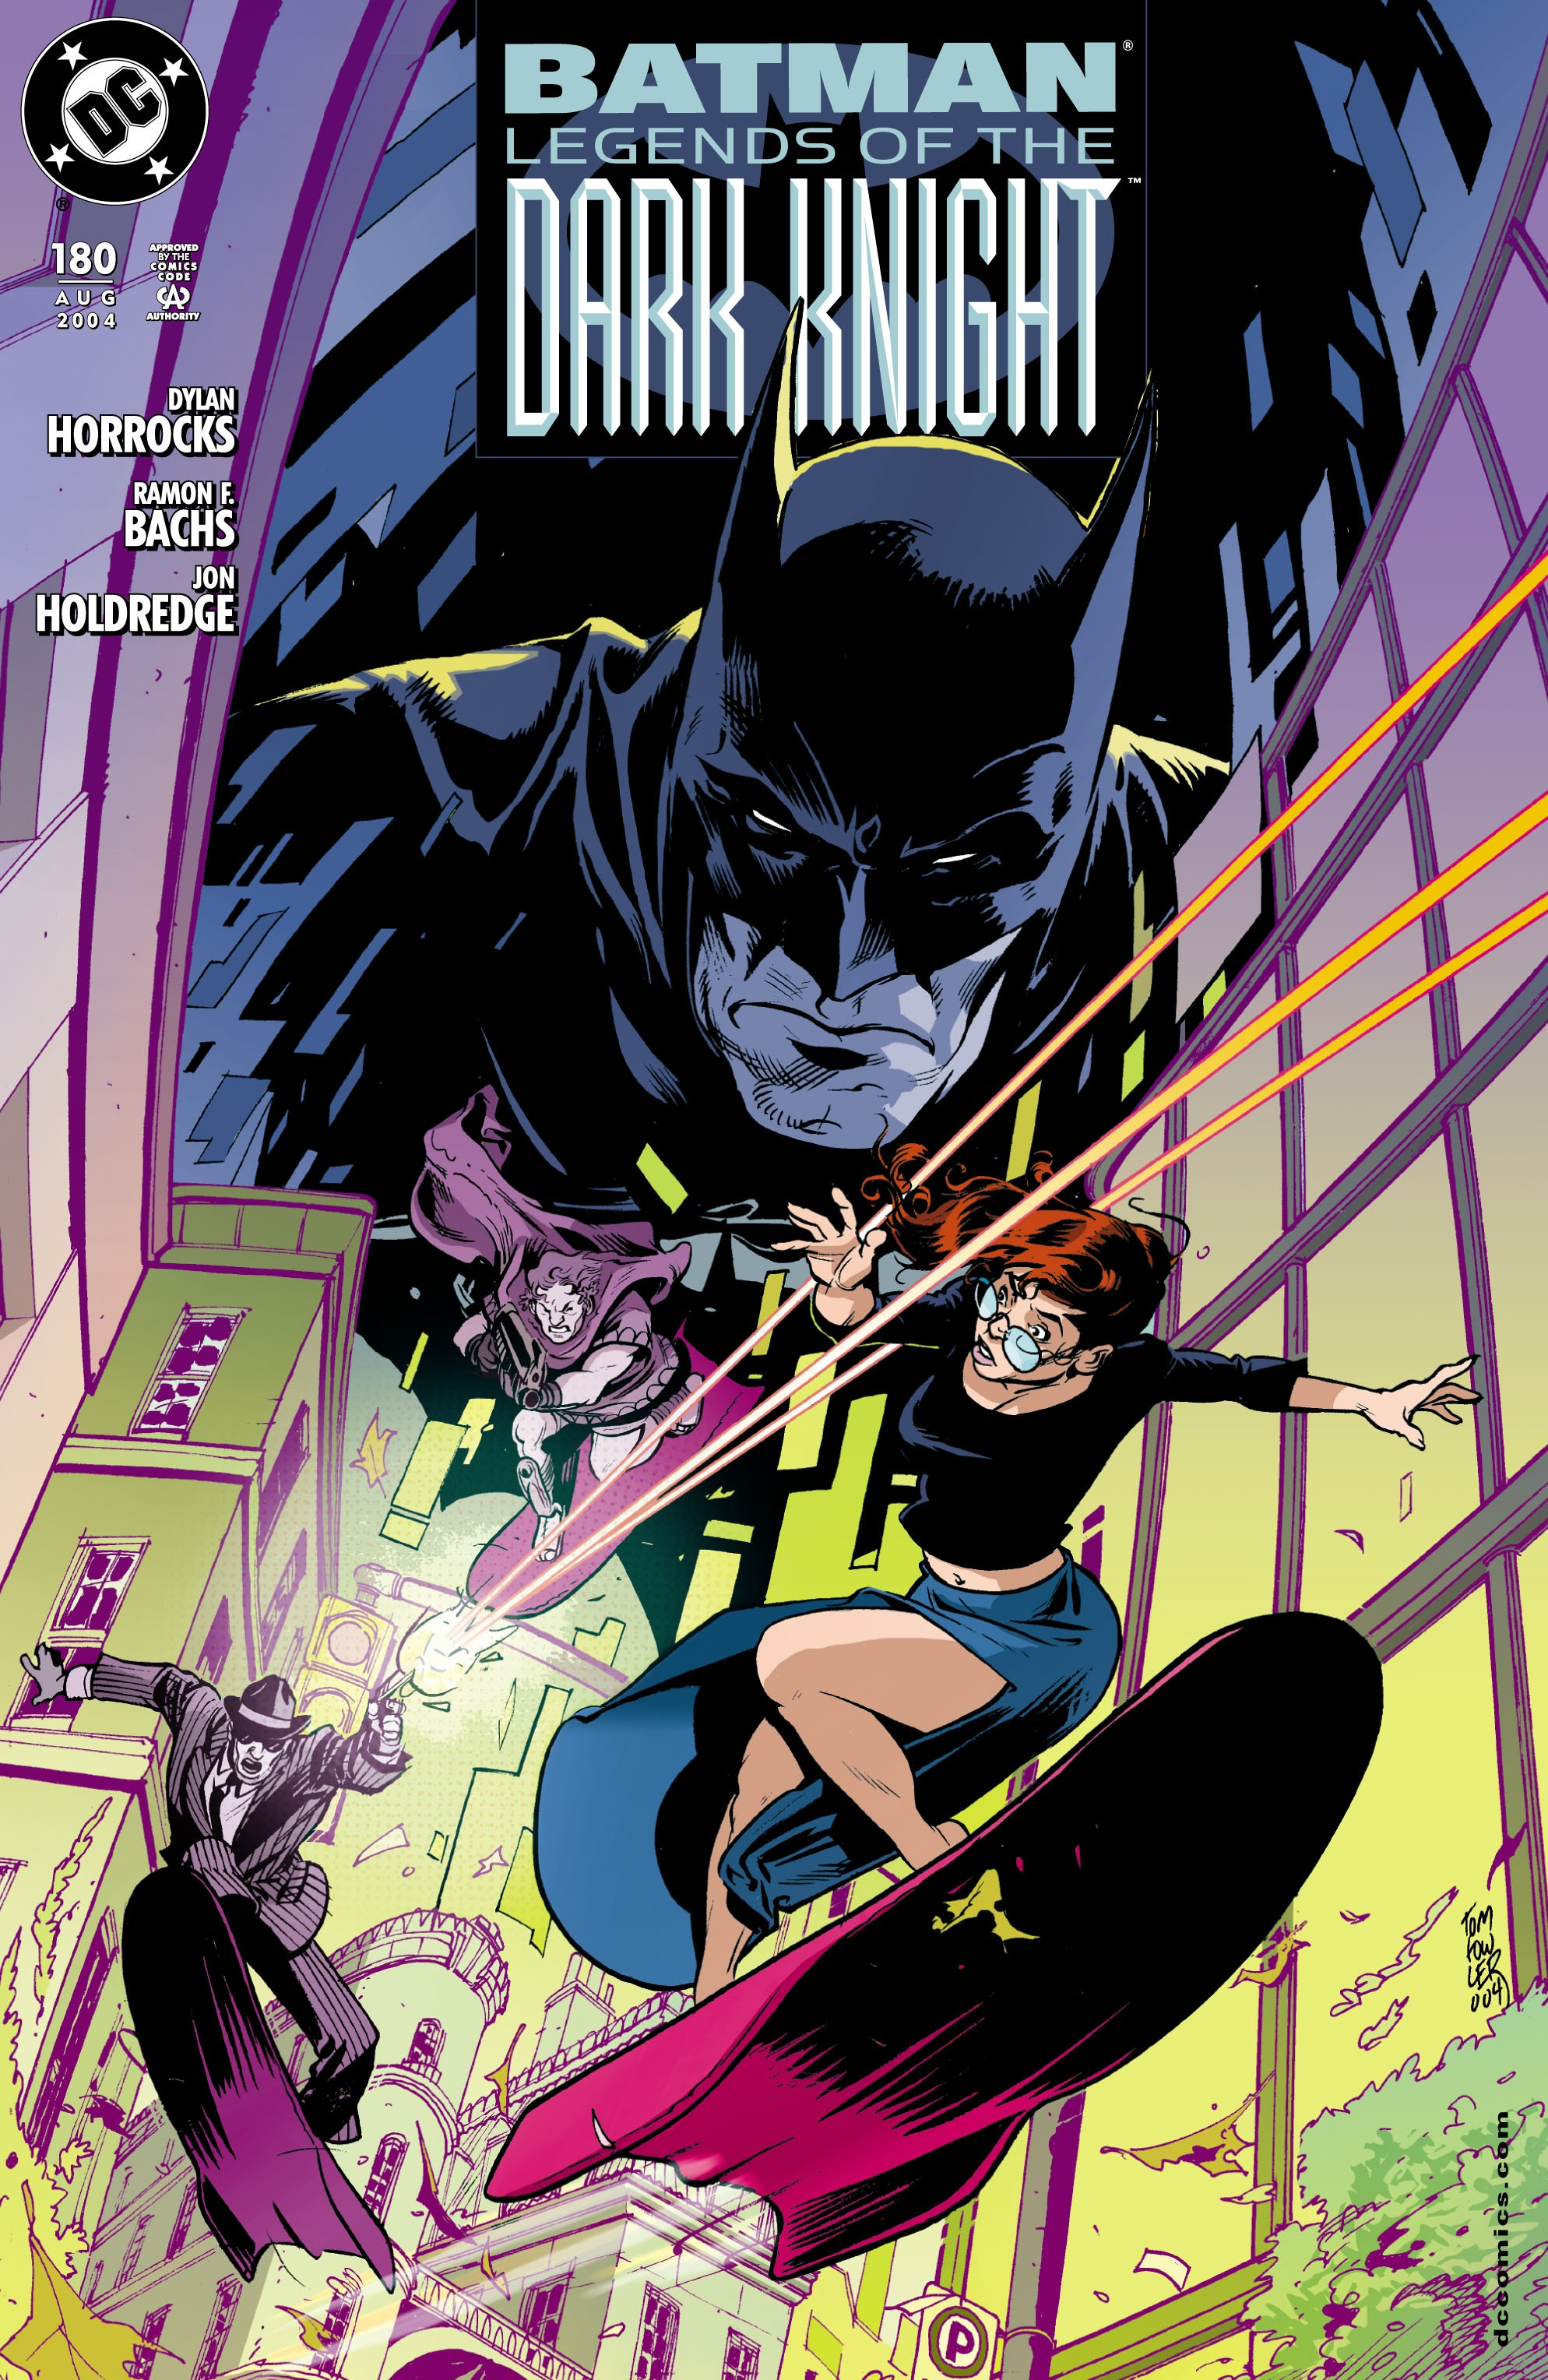 Batman: Legends of the Dark Knight 180 Page 1